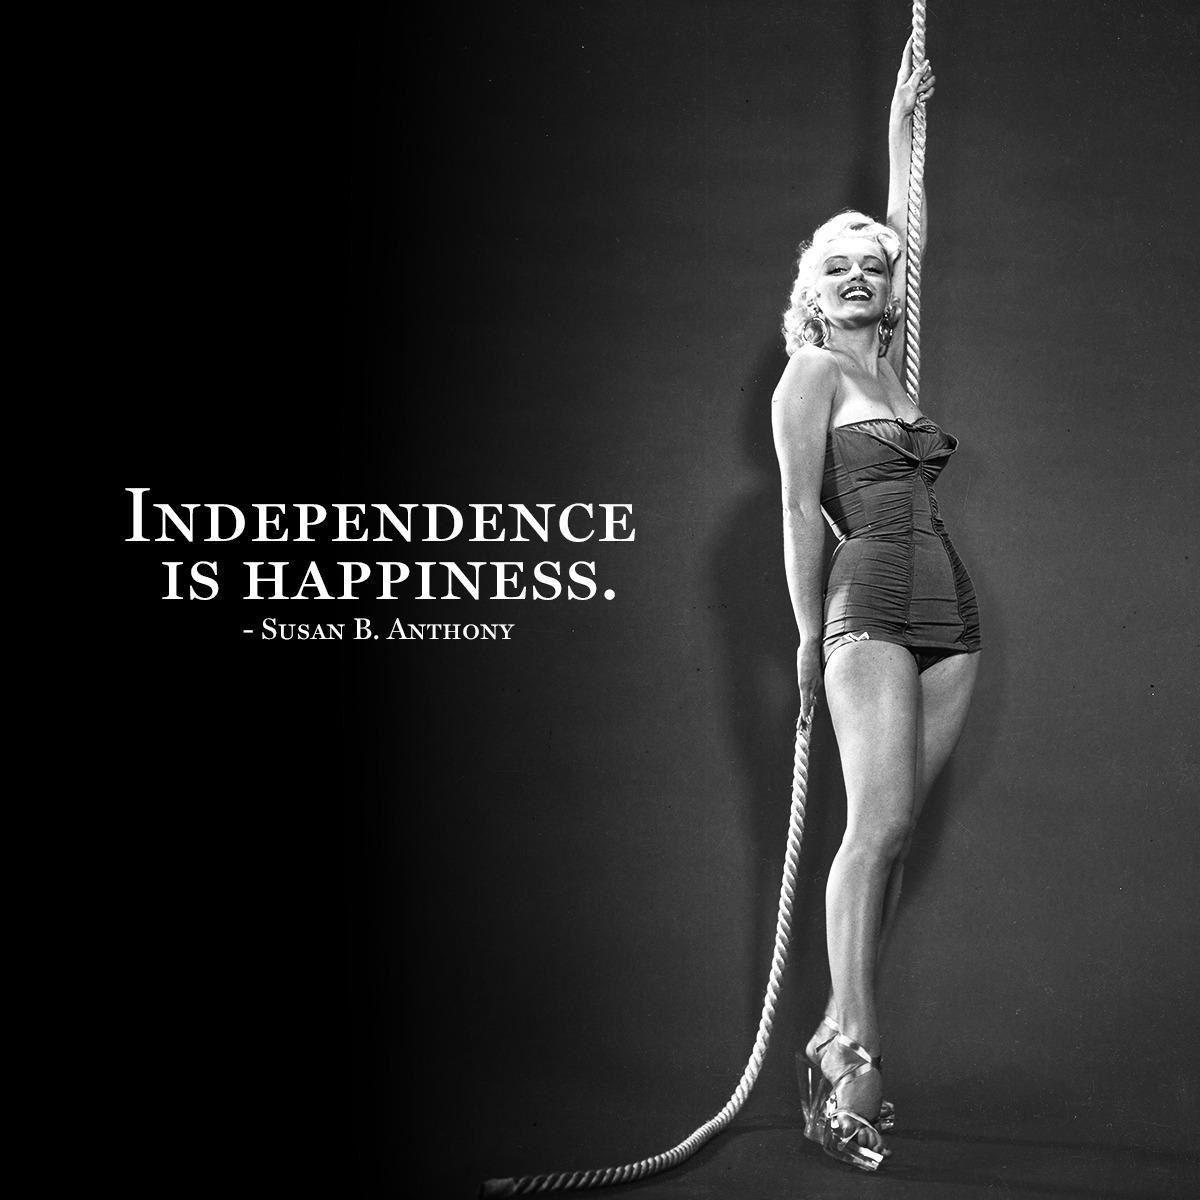 No, Marilyn Monroe never said that: http://t.co/Mi1sPU3OLO http://t.co/JHwo72jZre